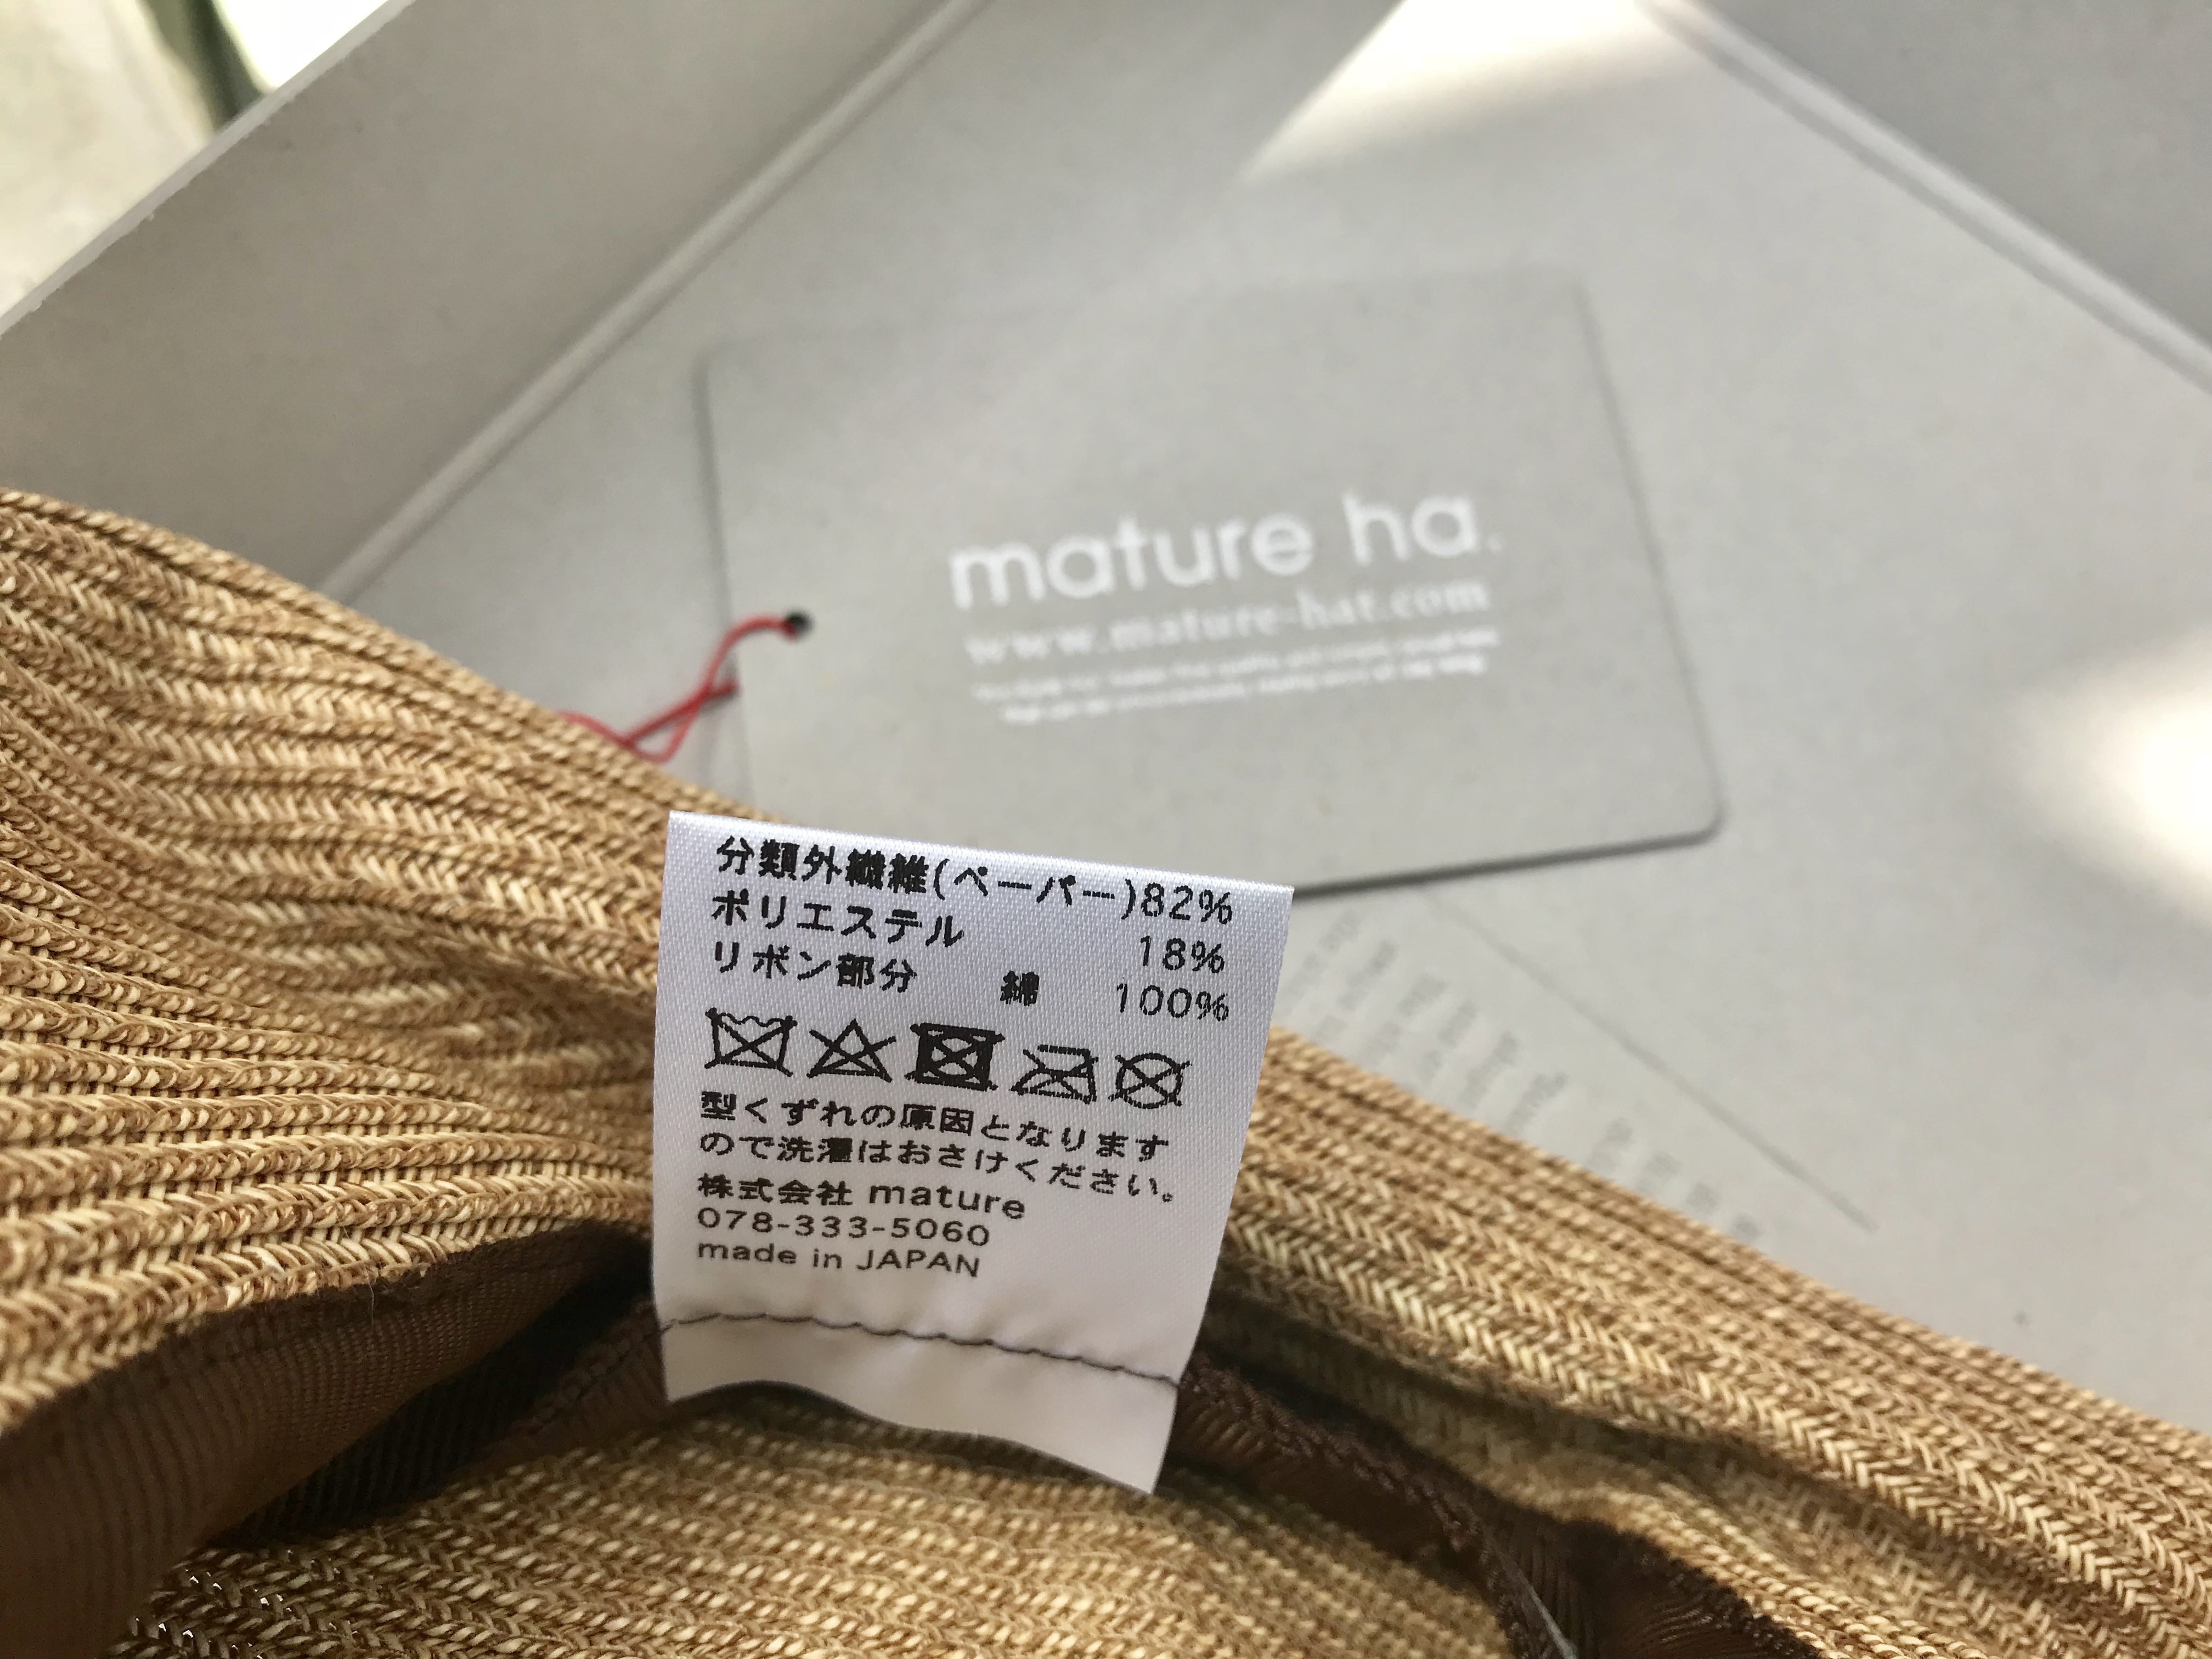 maturebh-mb